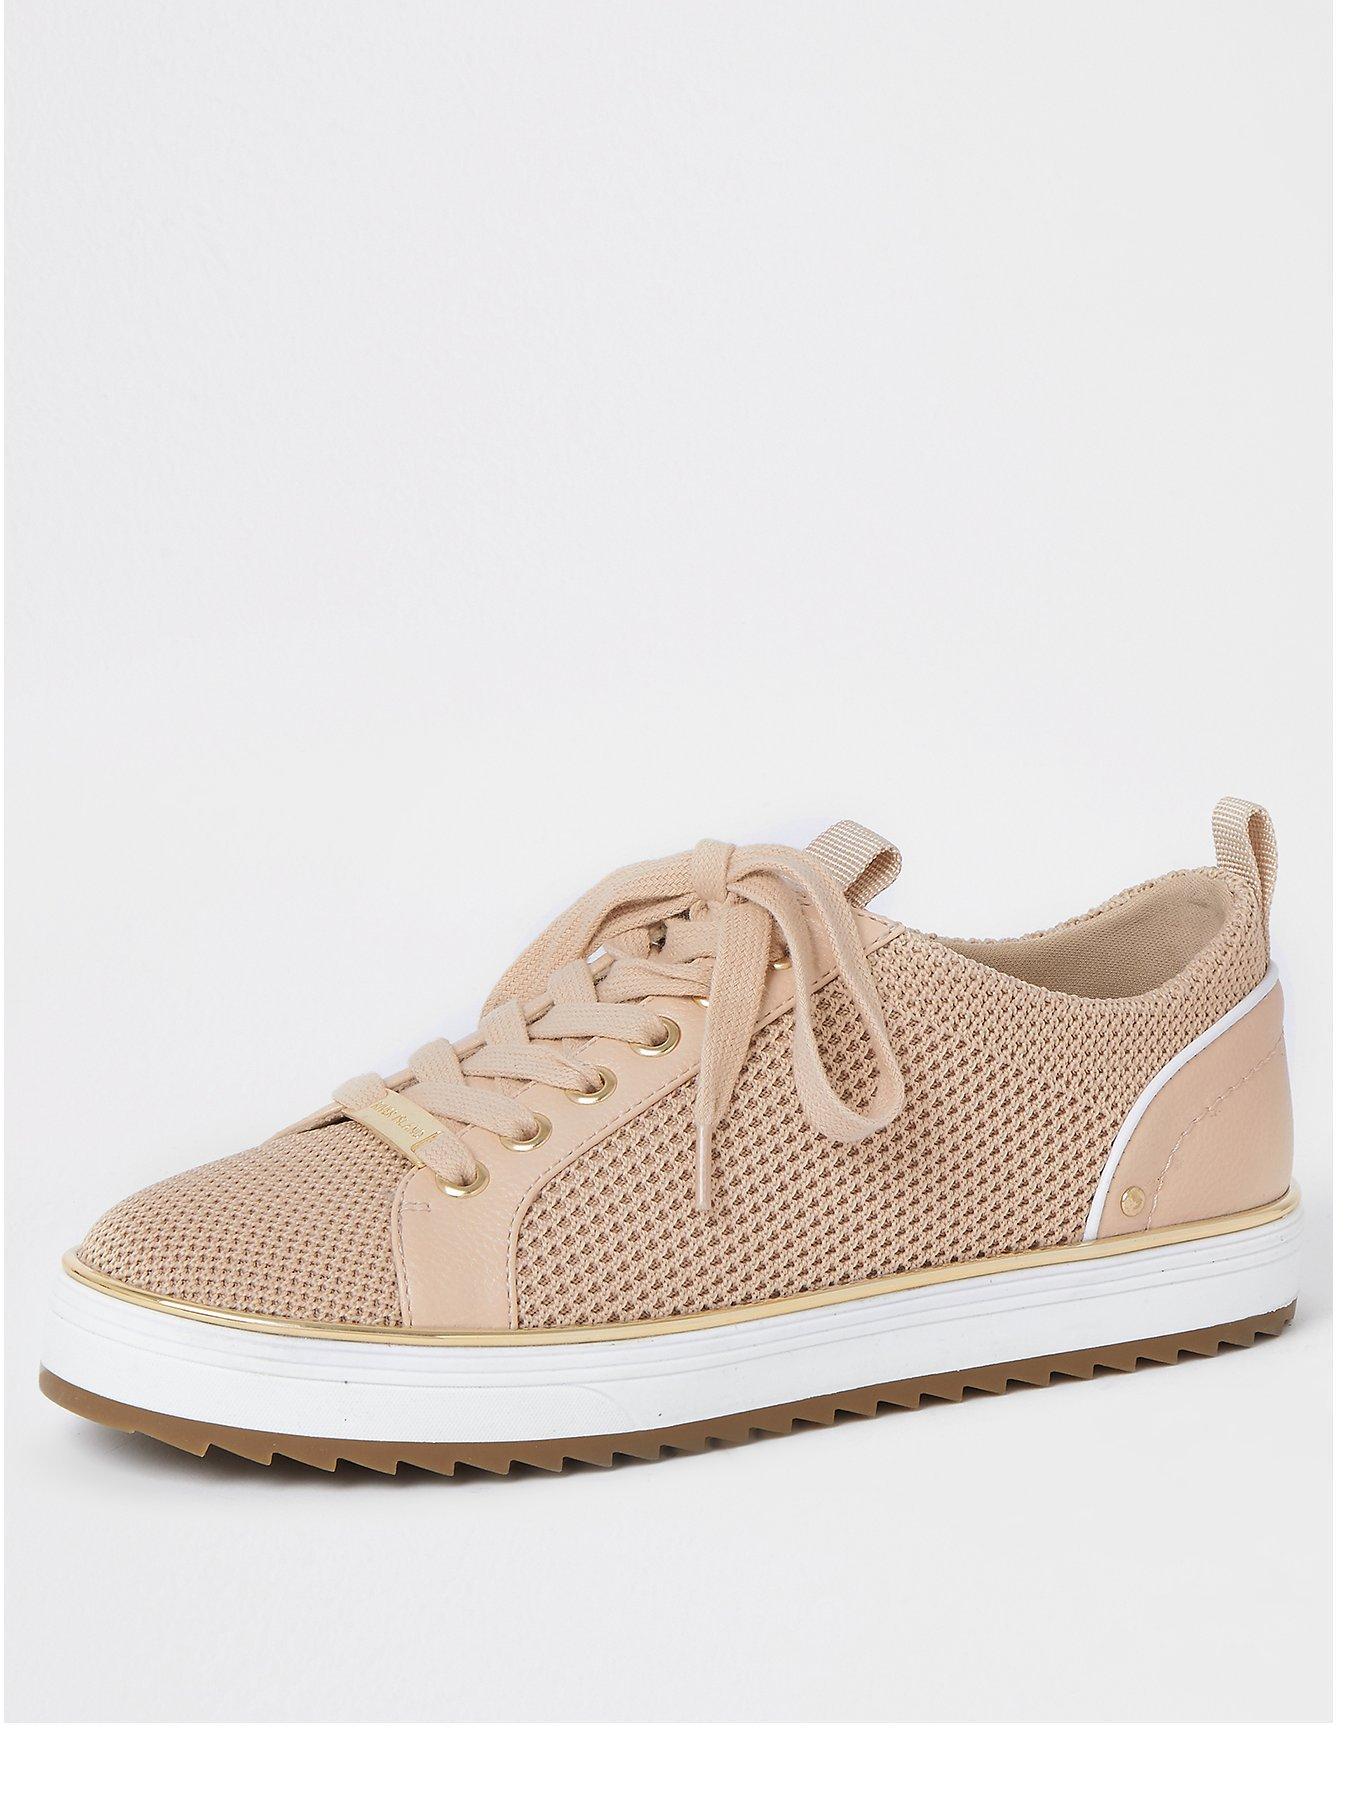 Casual   River island   Shoes \u0026 boots